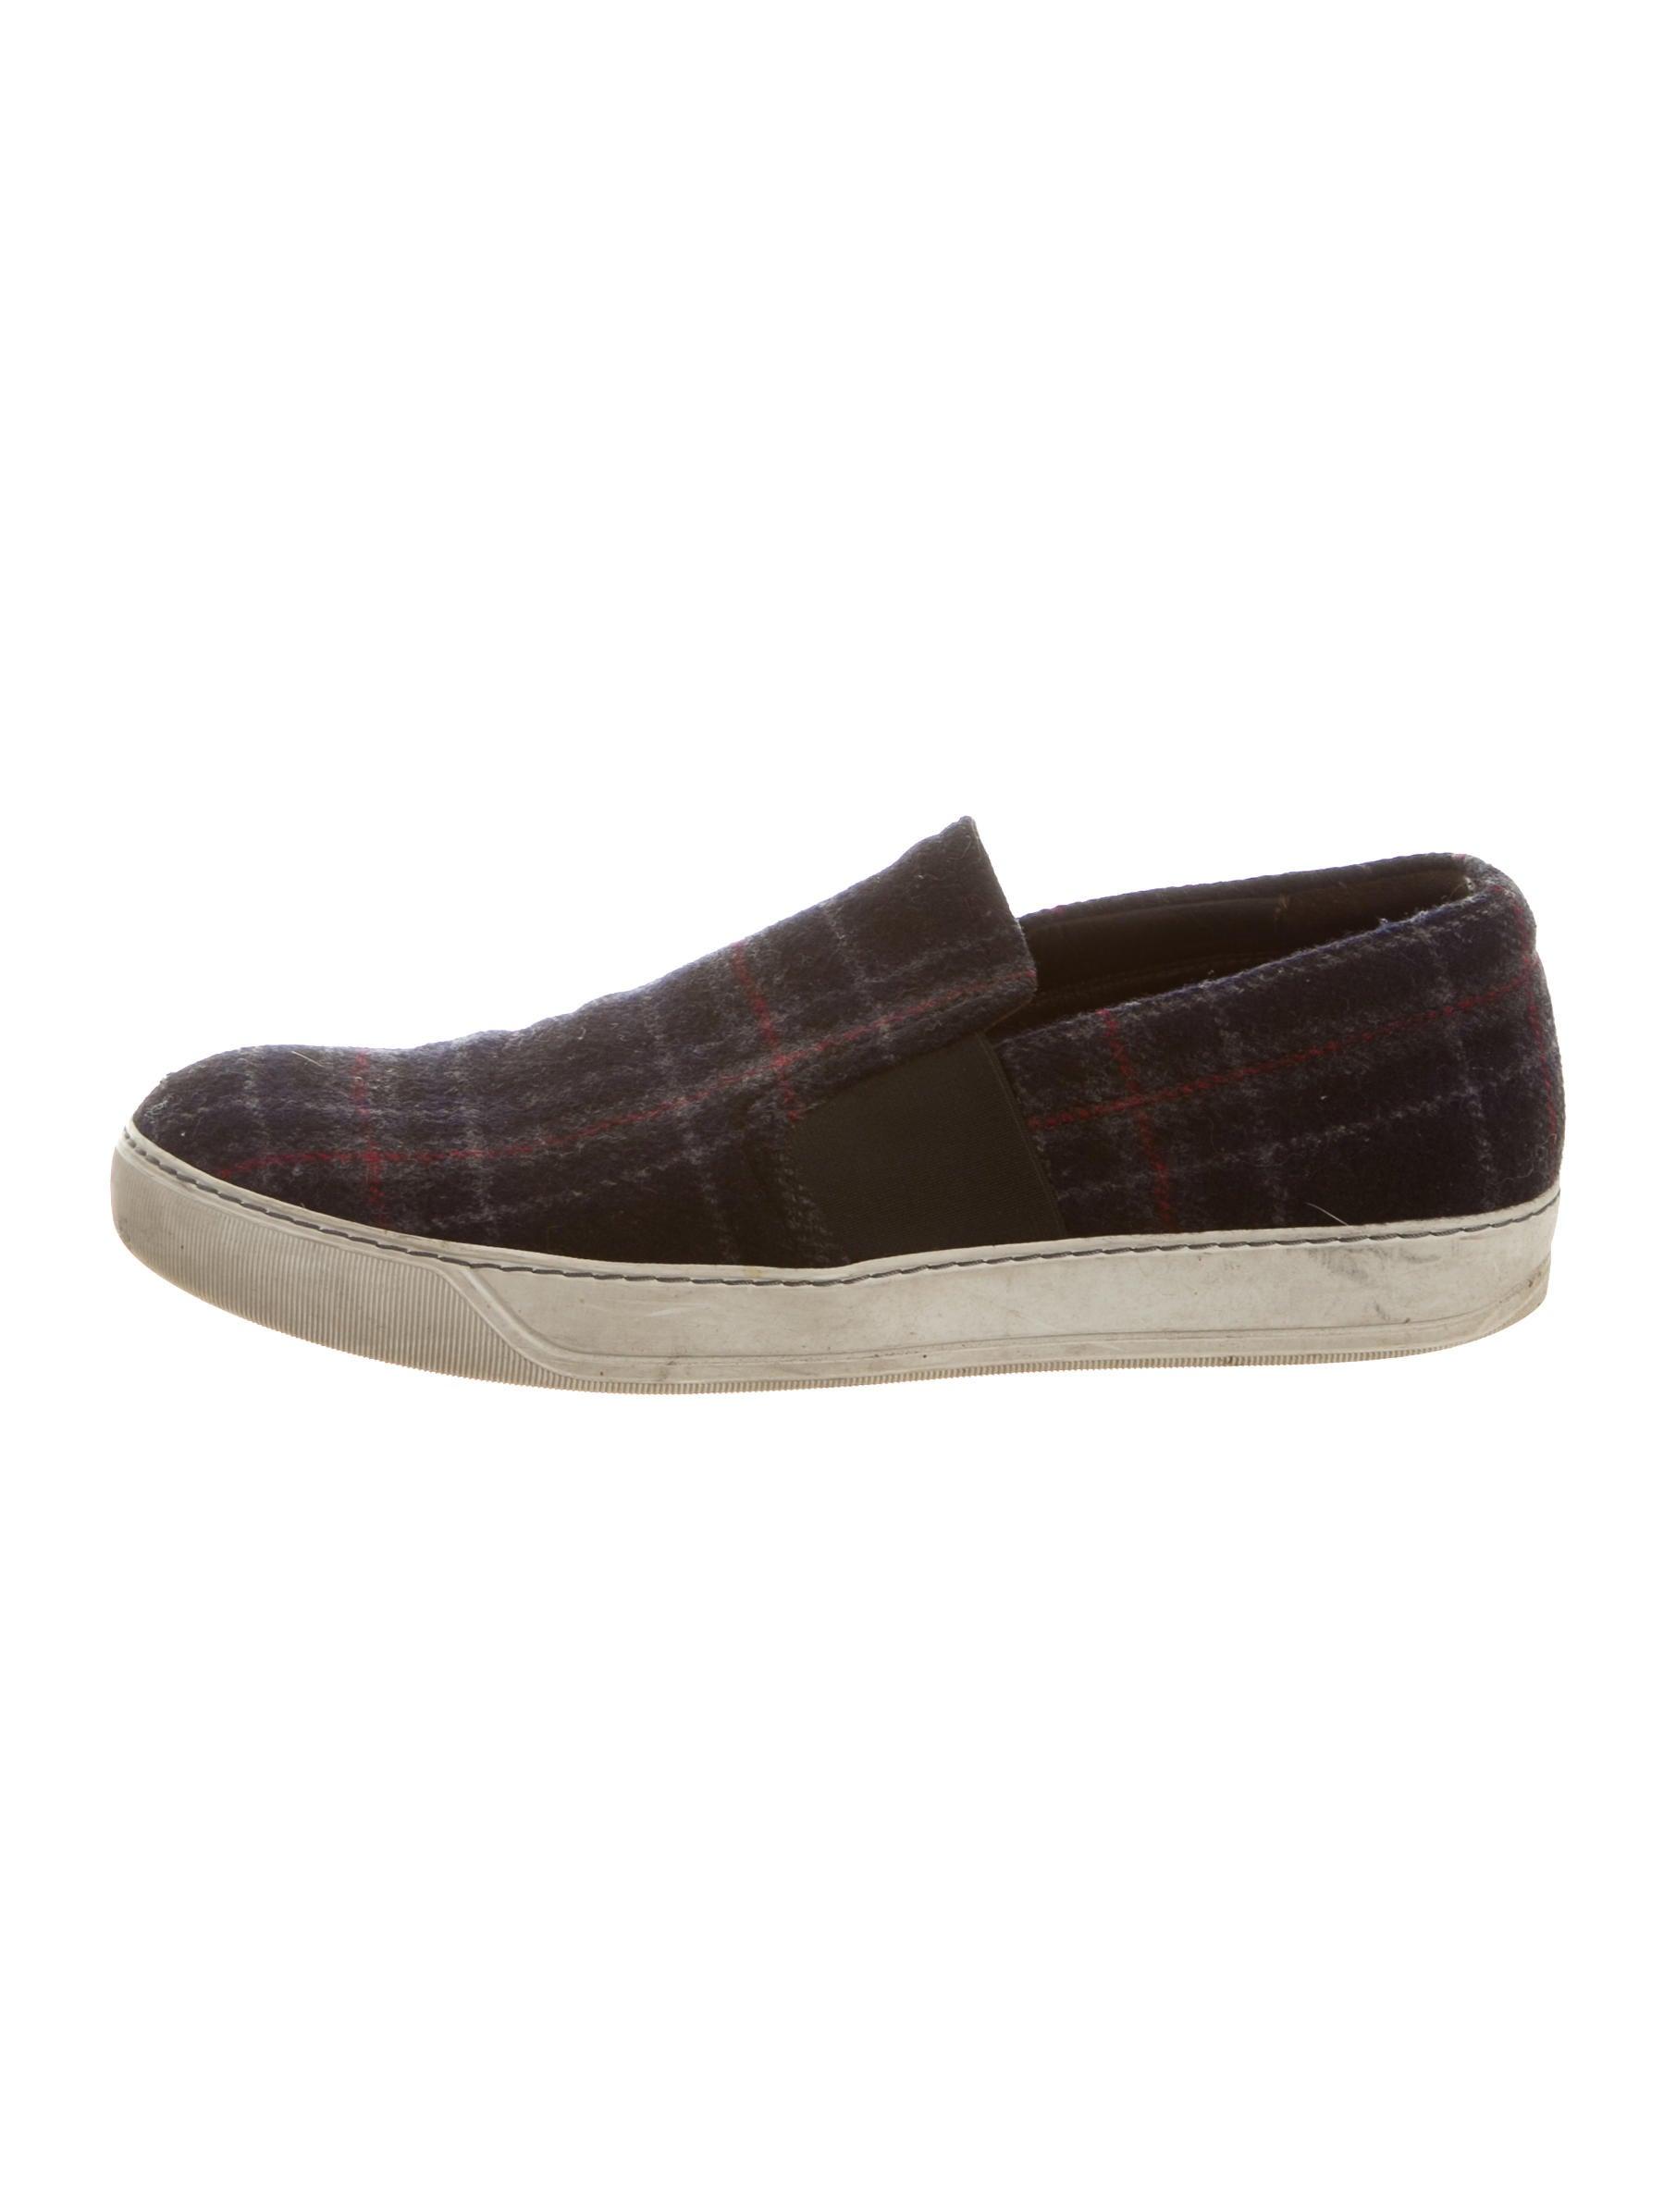 lanvin plaid slip on sneakers shoes lan47521 the